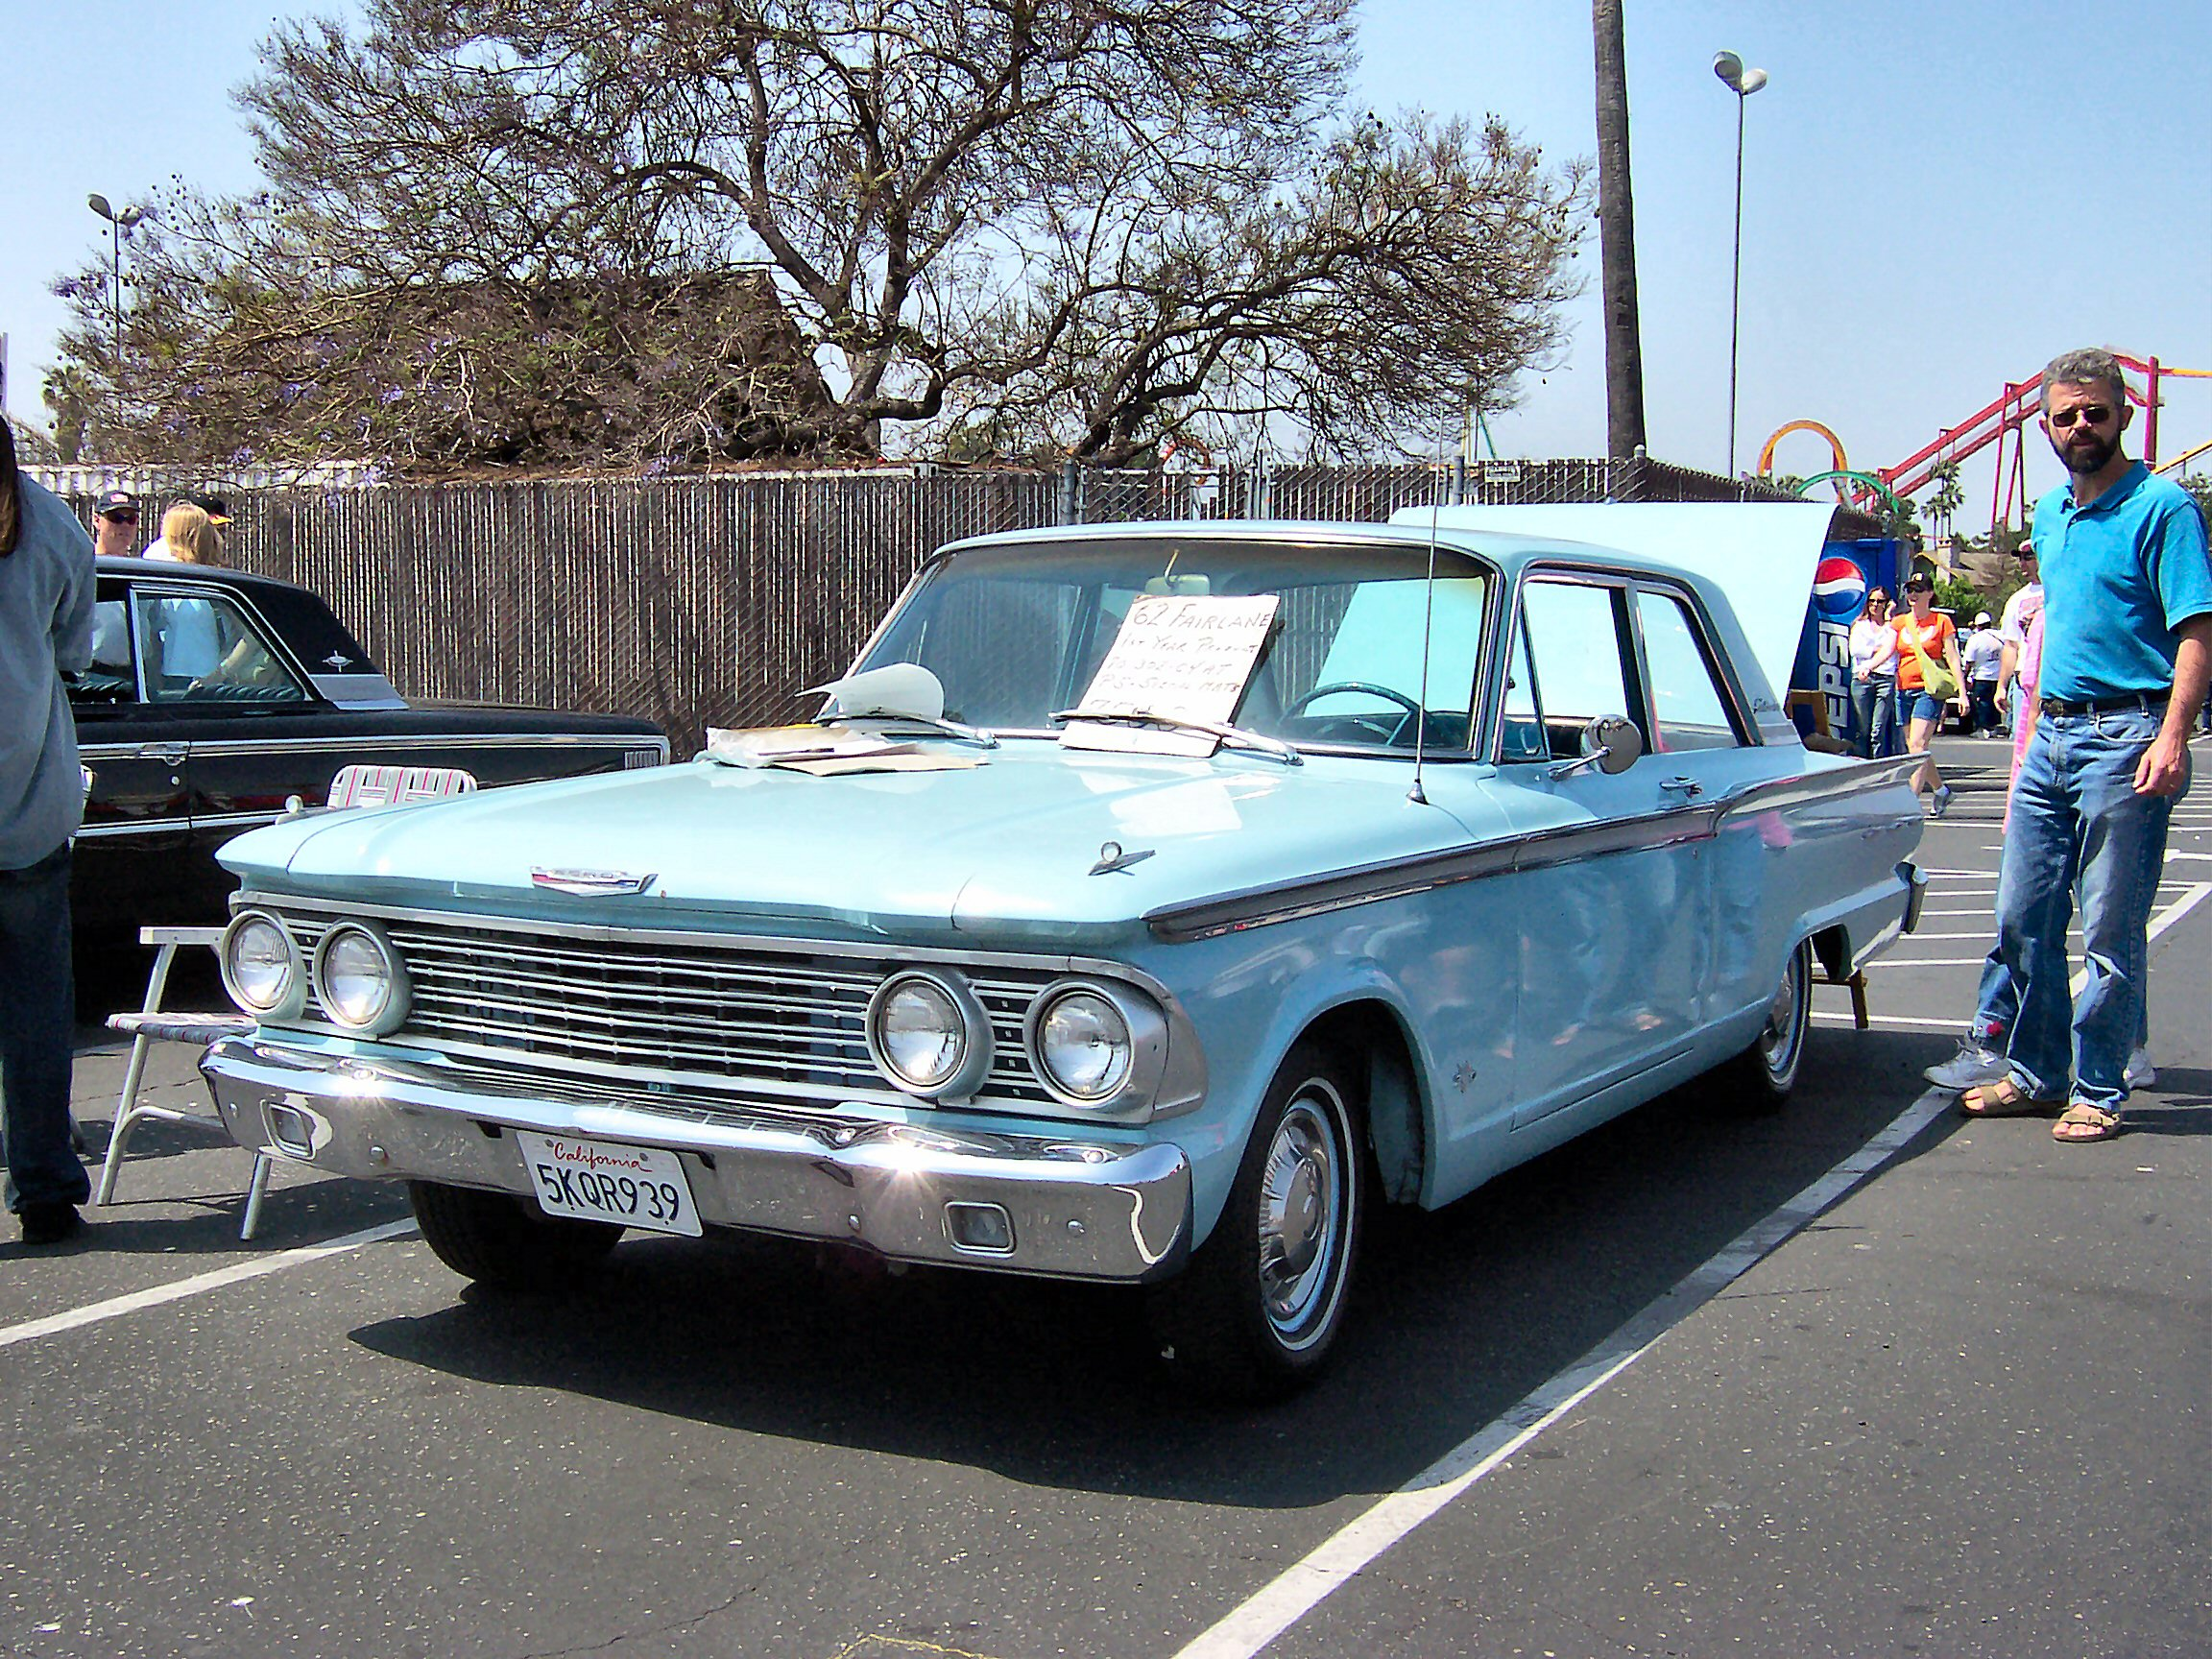 File:1962 Ford Fairlane.jpg